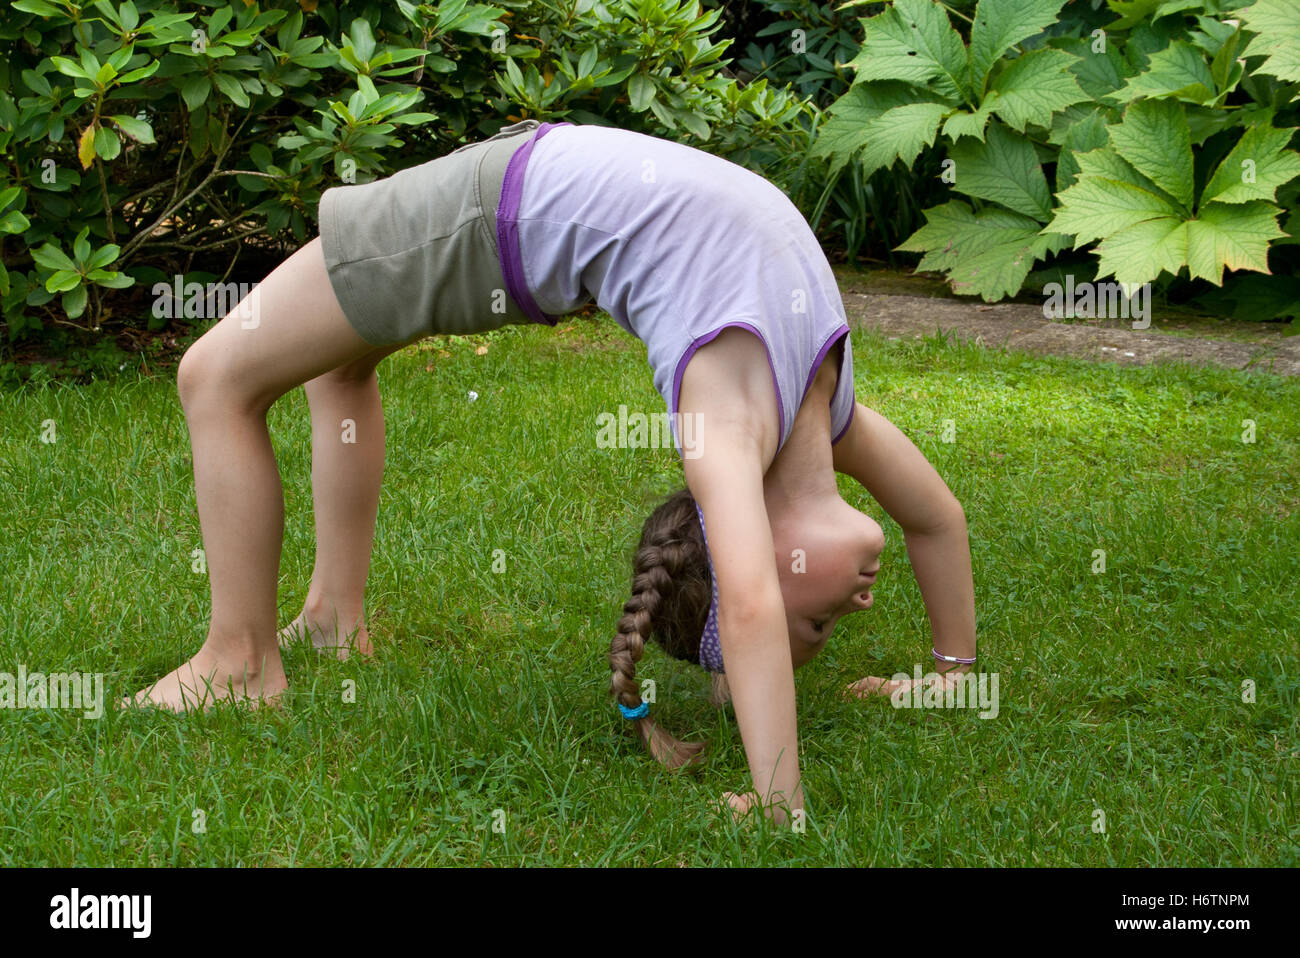 sport sports sporty athletic wiry pithy heavyset tight sporting yoga mobile blond girl girls child children kids - Stock Image